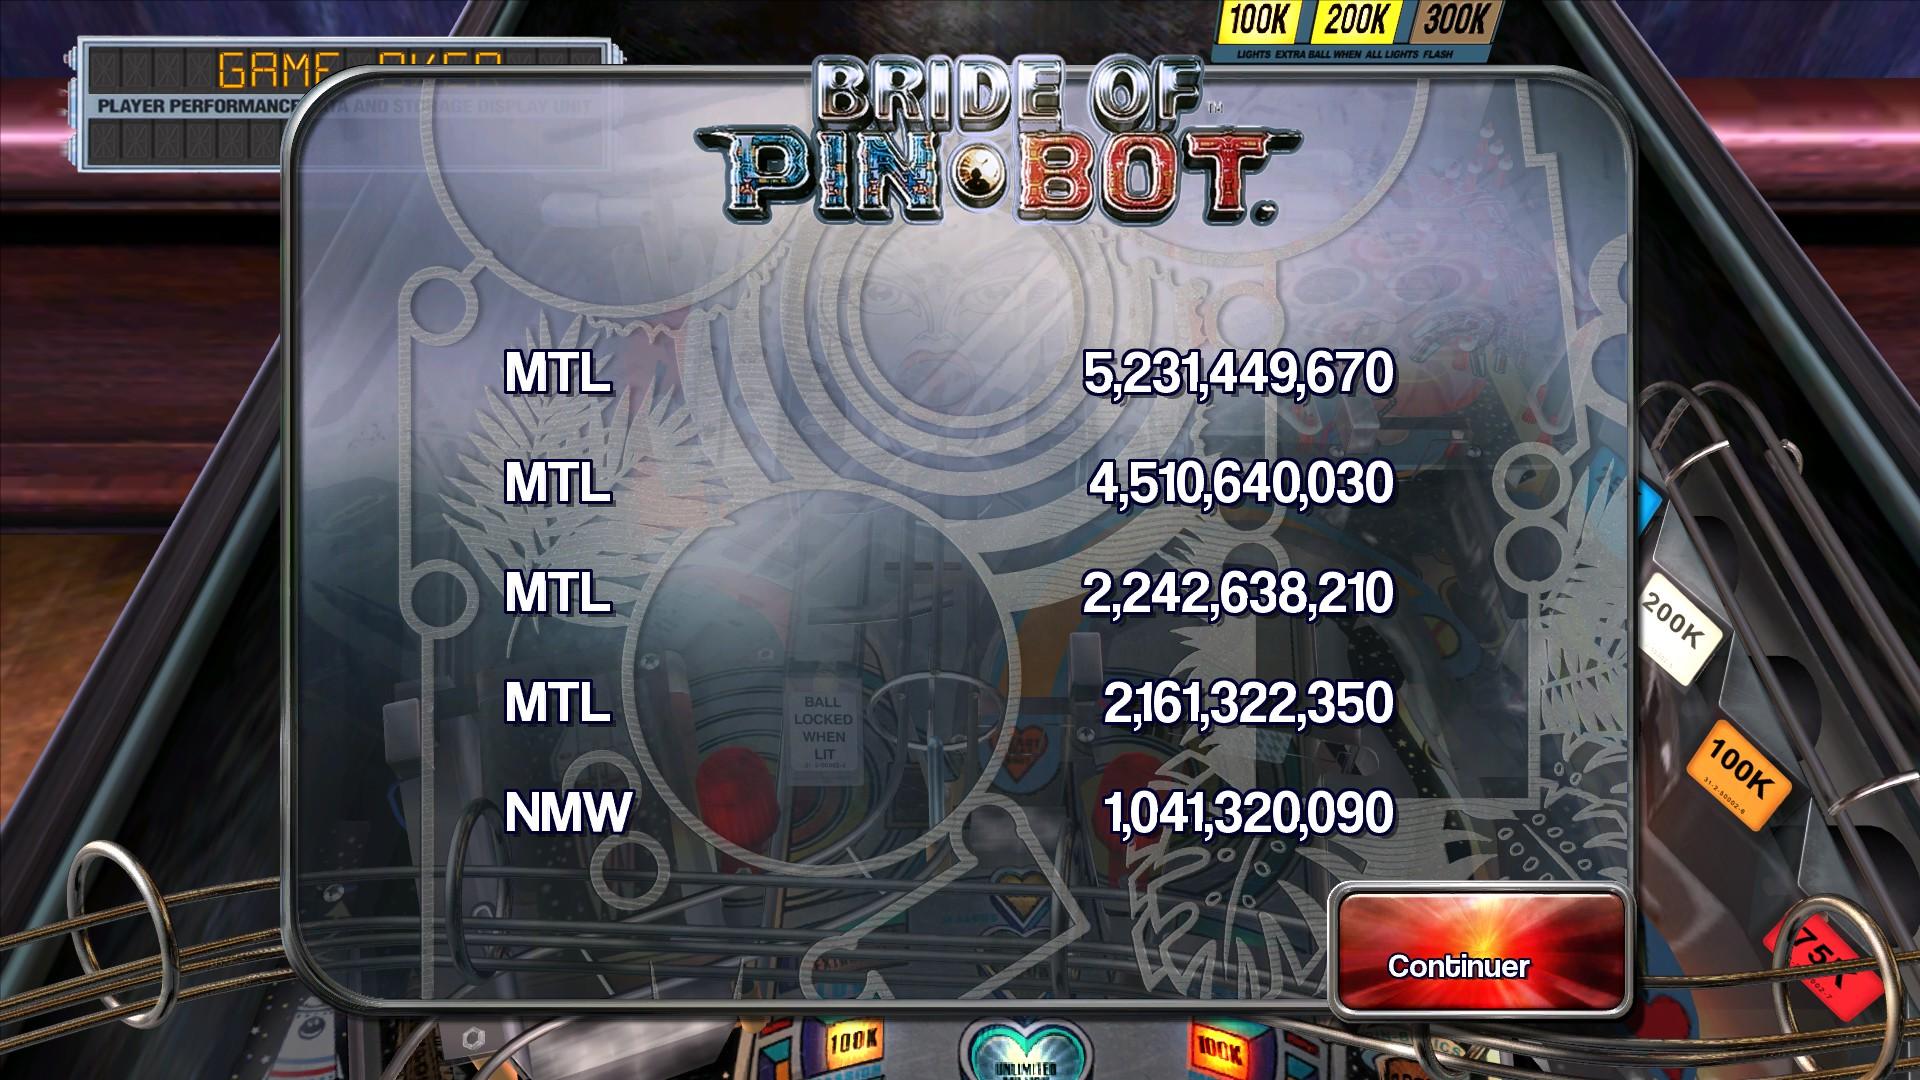 Mantalow: Pinball Arcade: The Machine: Bride of Pin*Bot (PC) 5,231,449,670 points on 2015-04-11 05:32:27